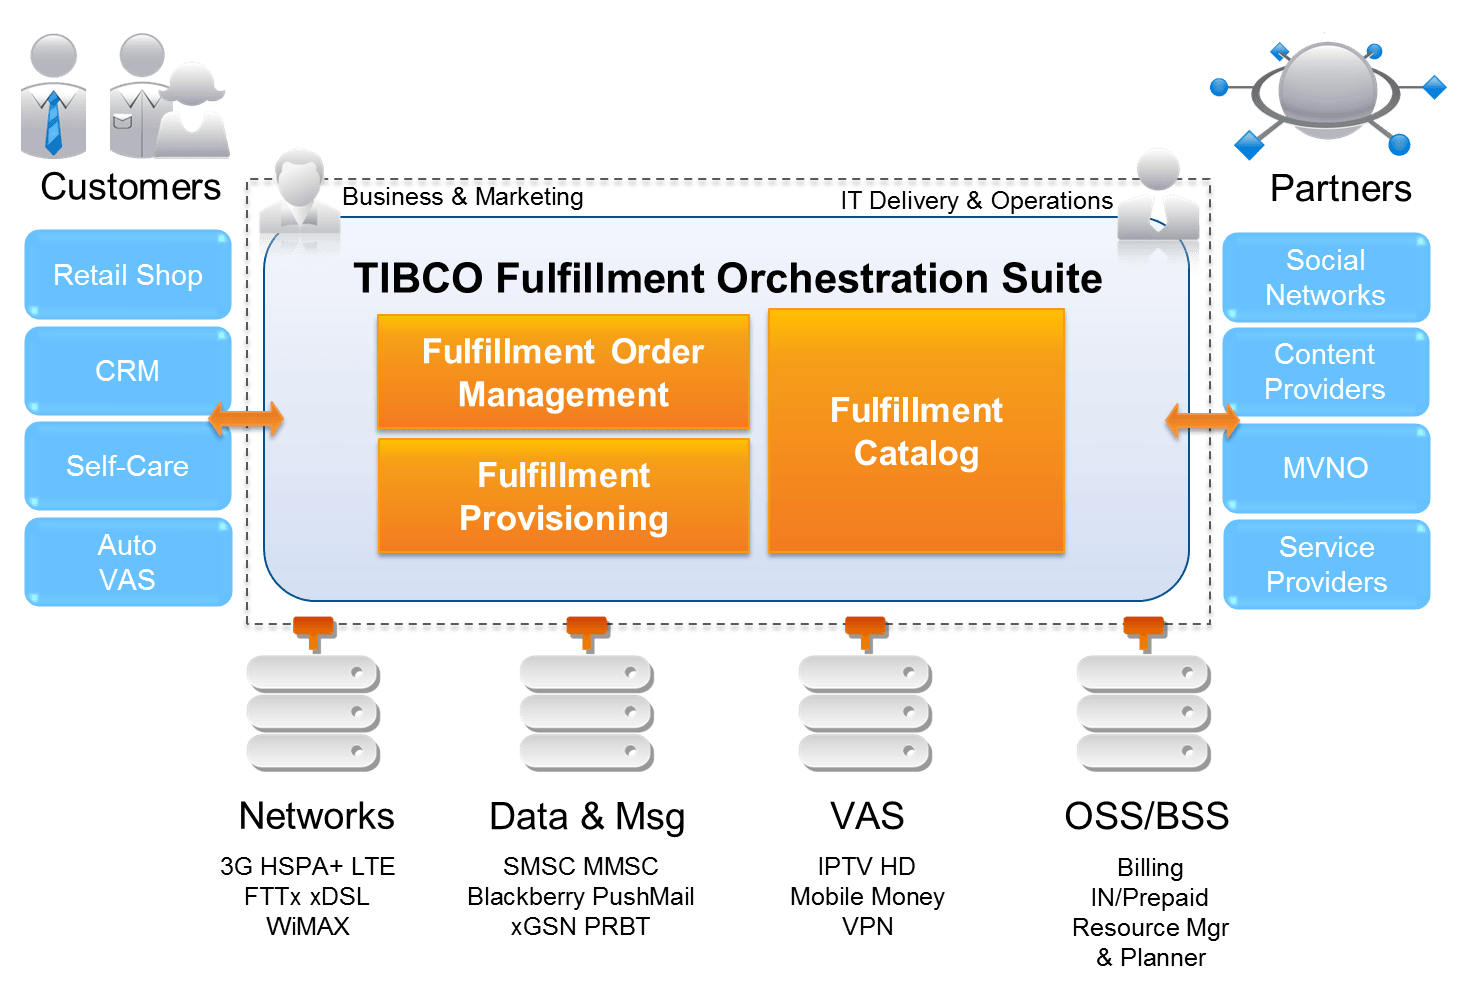 hight resolution of tibco fulfillment orchestration suite tm forum rh tmforum org dodge journey radio wiring diagram 69 dodge